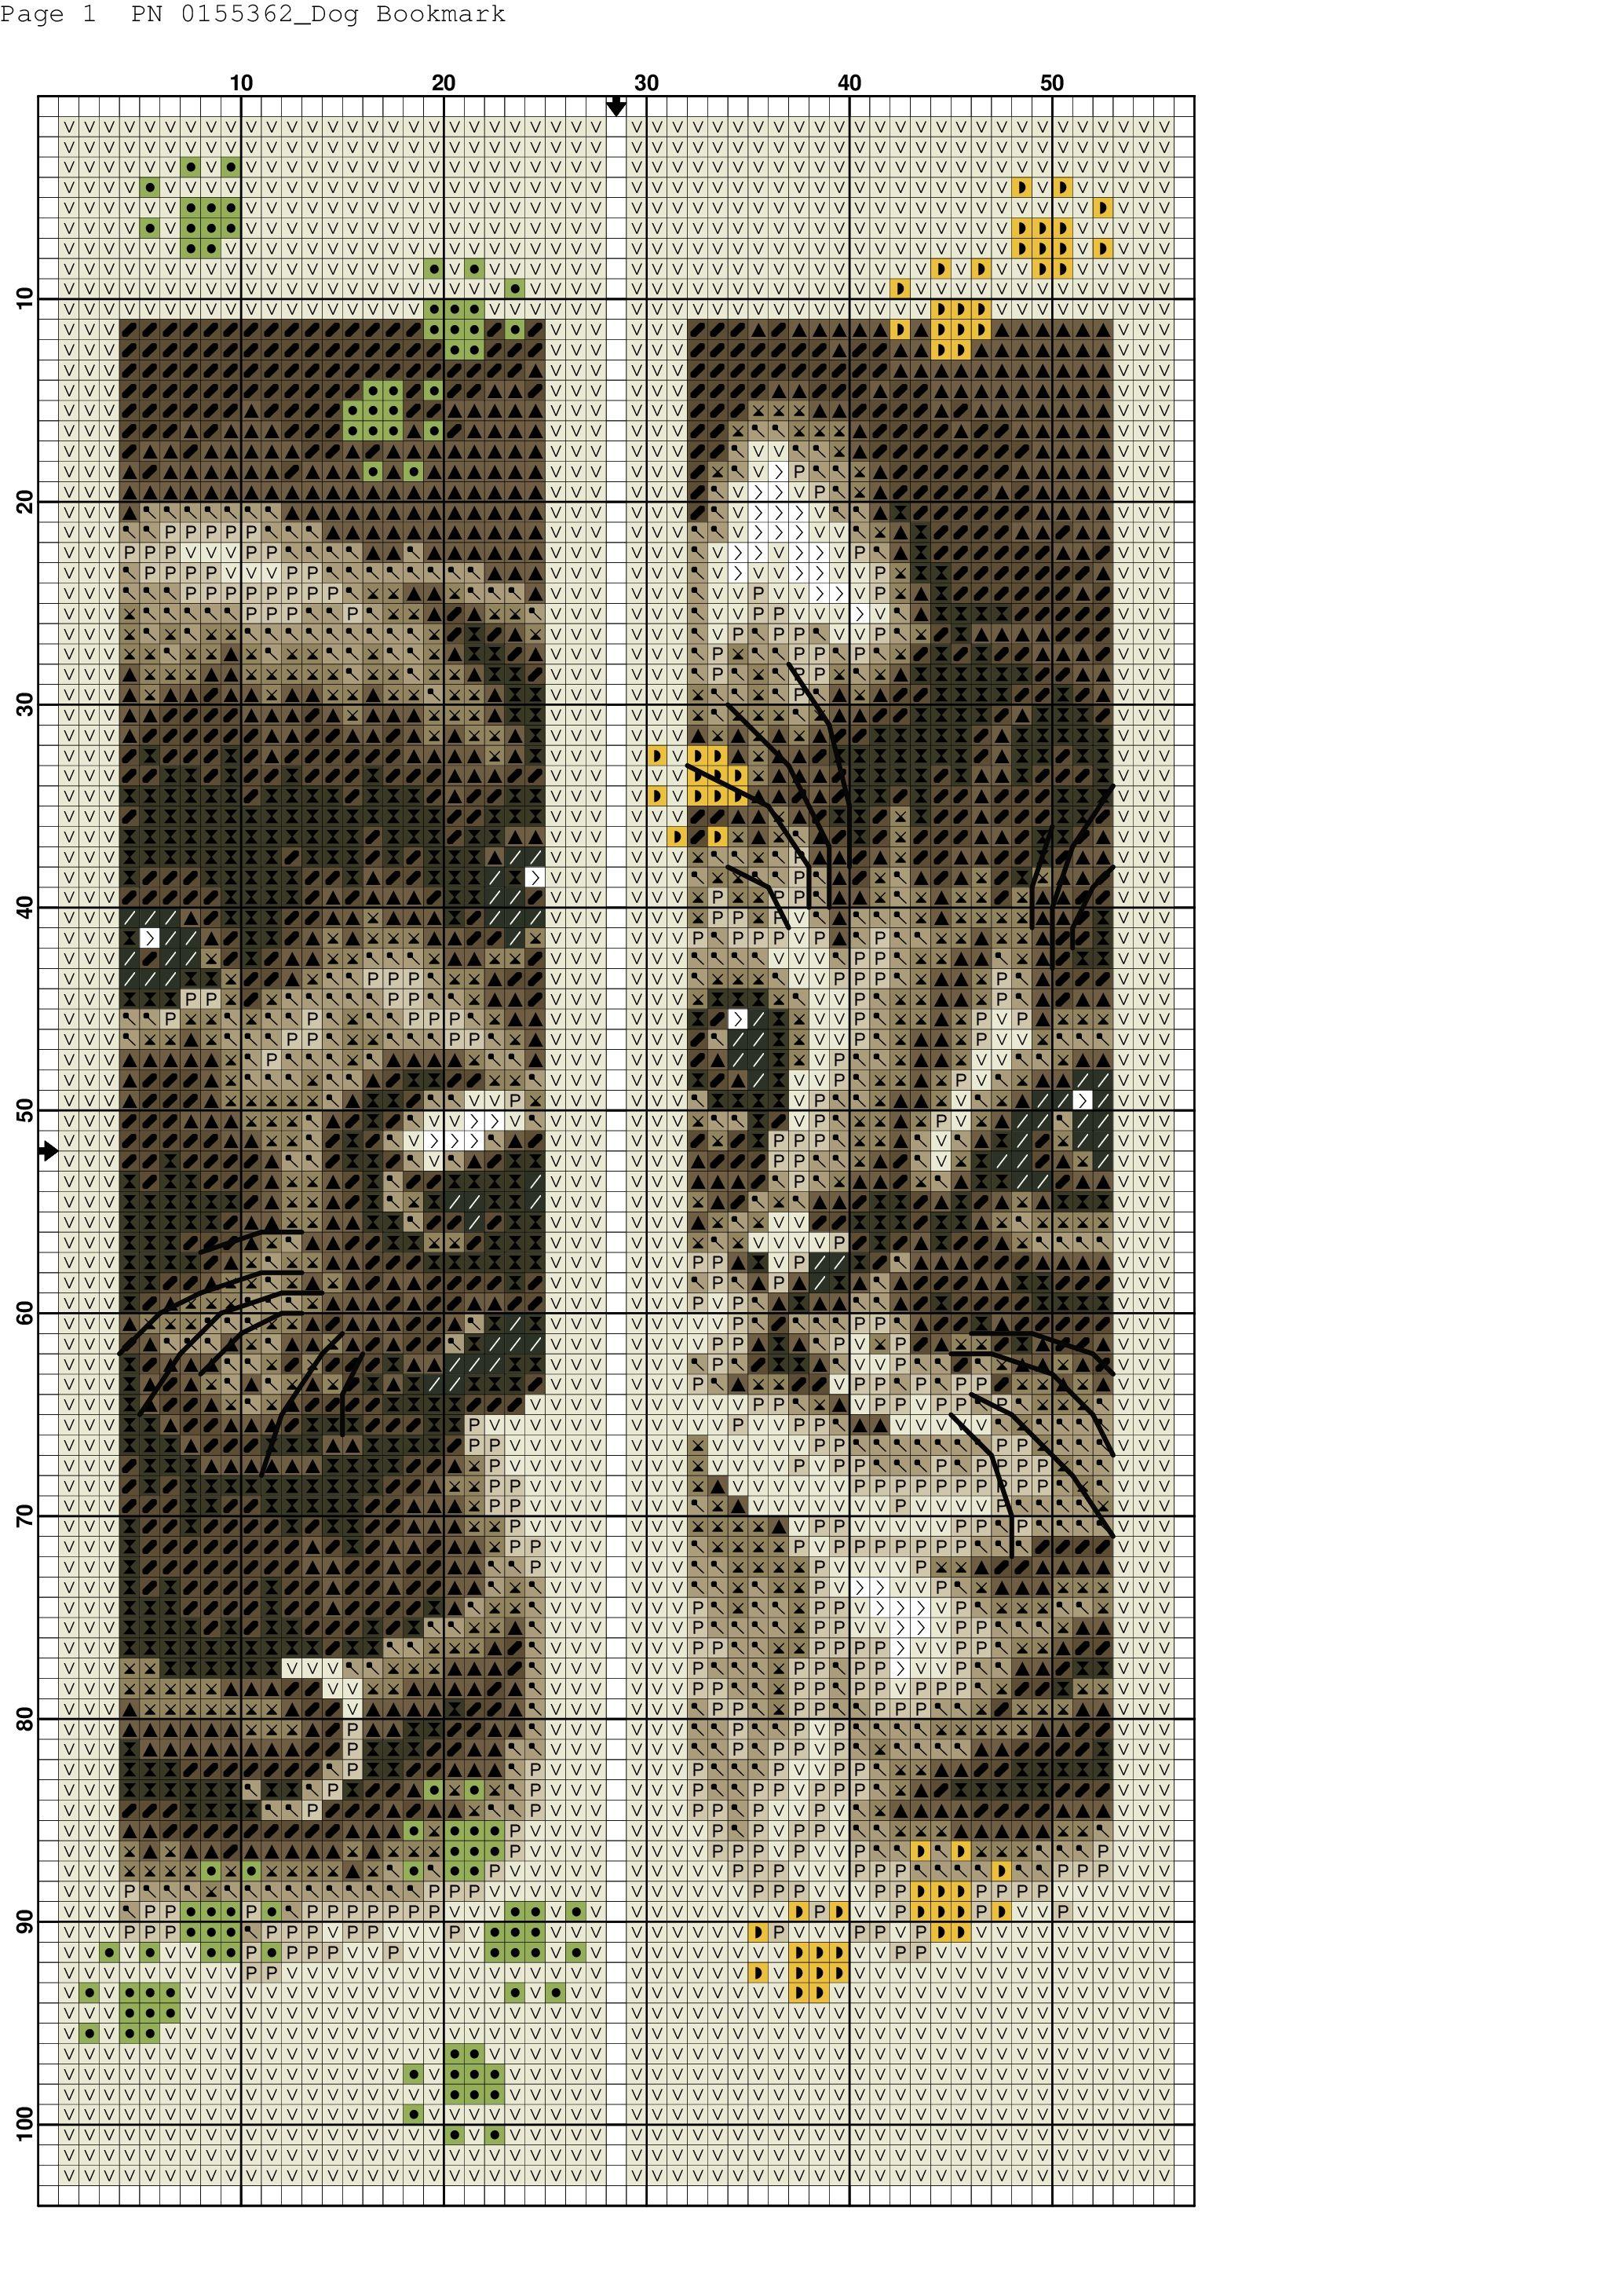 Dog Bookmark-001.jpg                                                                                                                                                     More